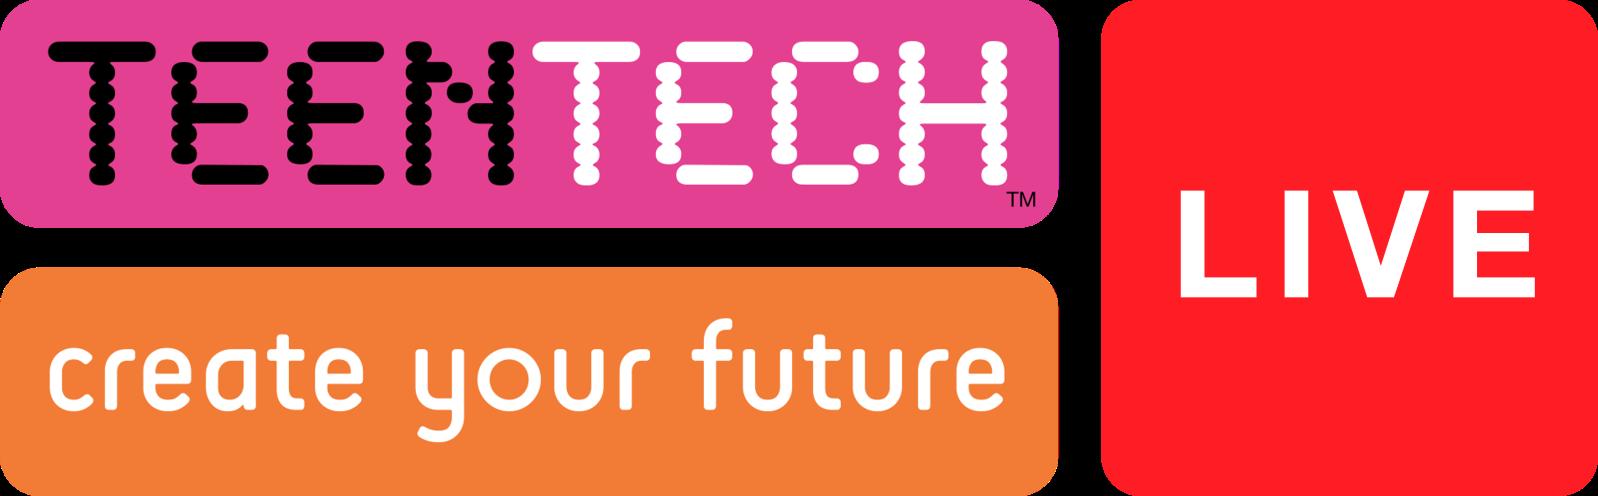 TeenTech Create Your Future Live